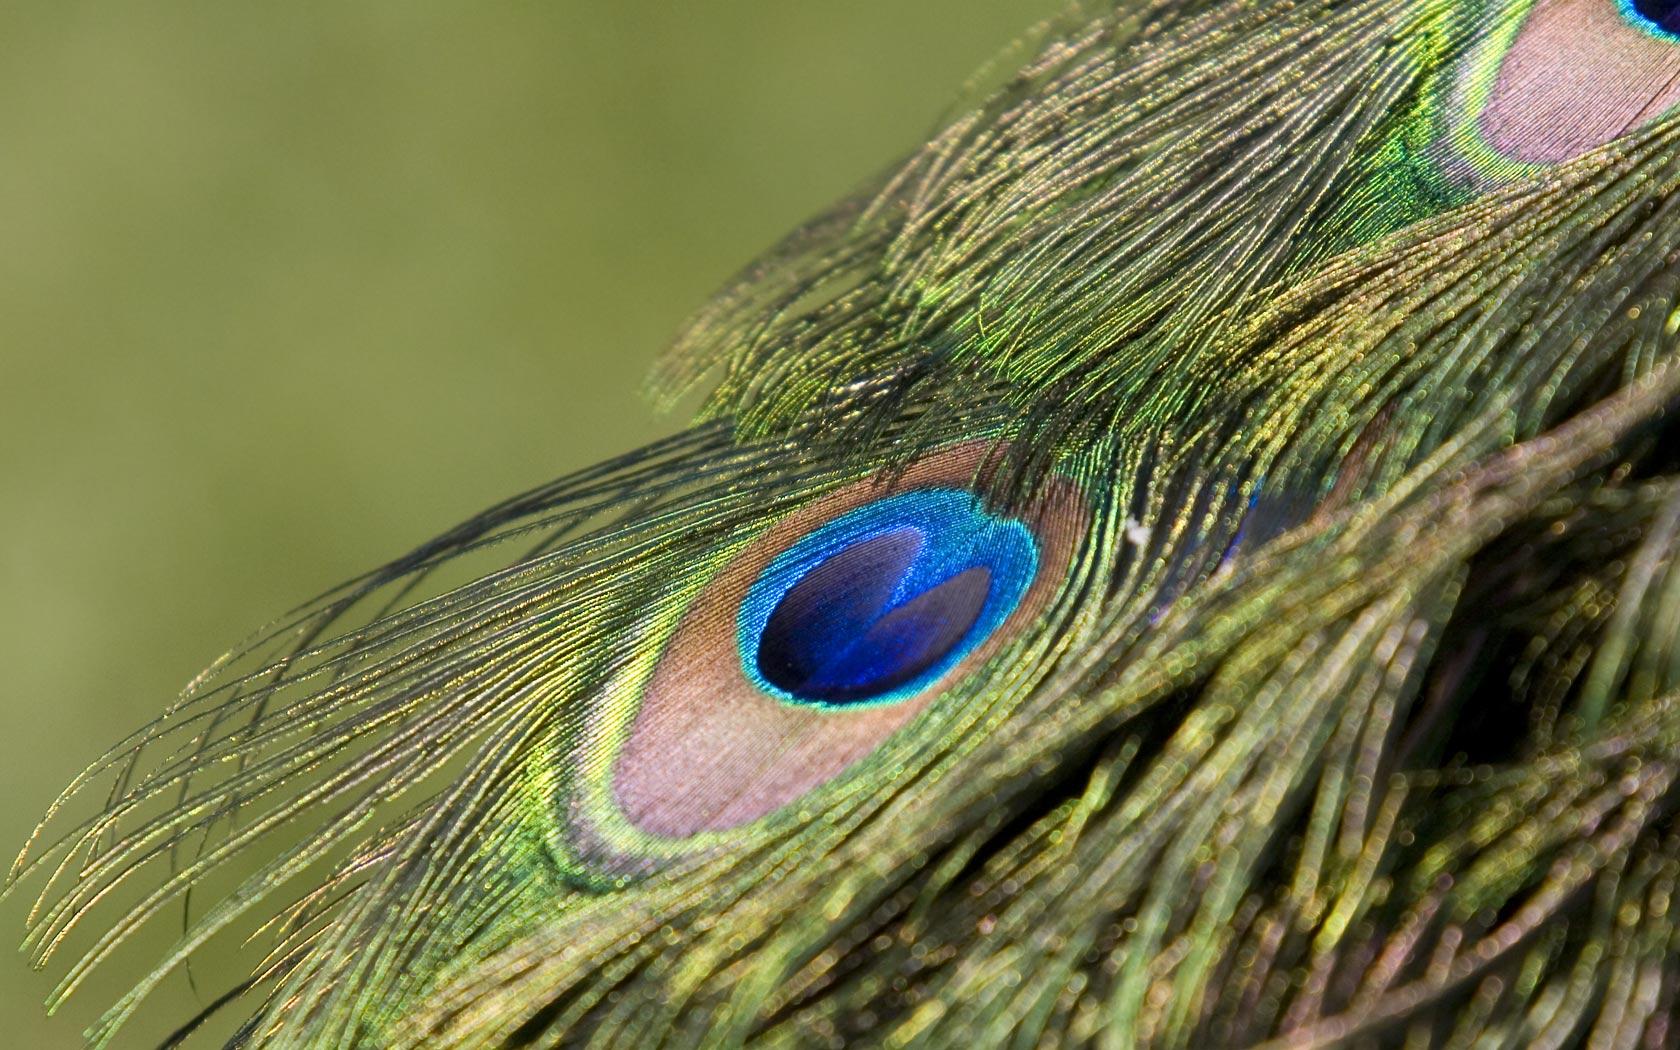 Desktop Wallpaper of a Peacock Feathers 1680x1050